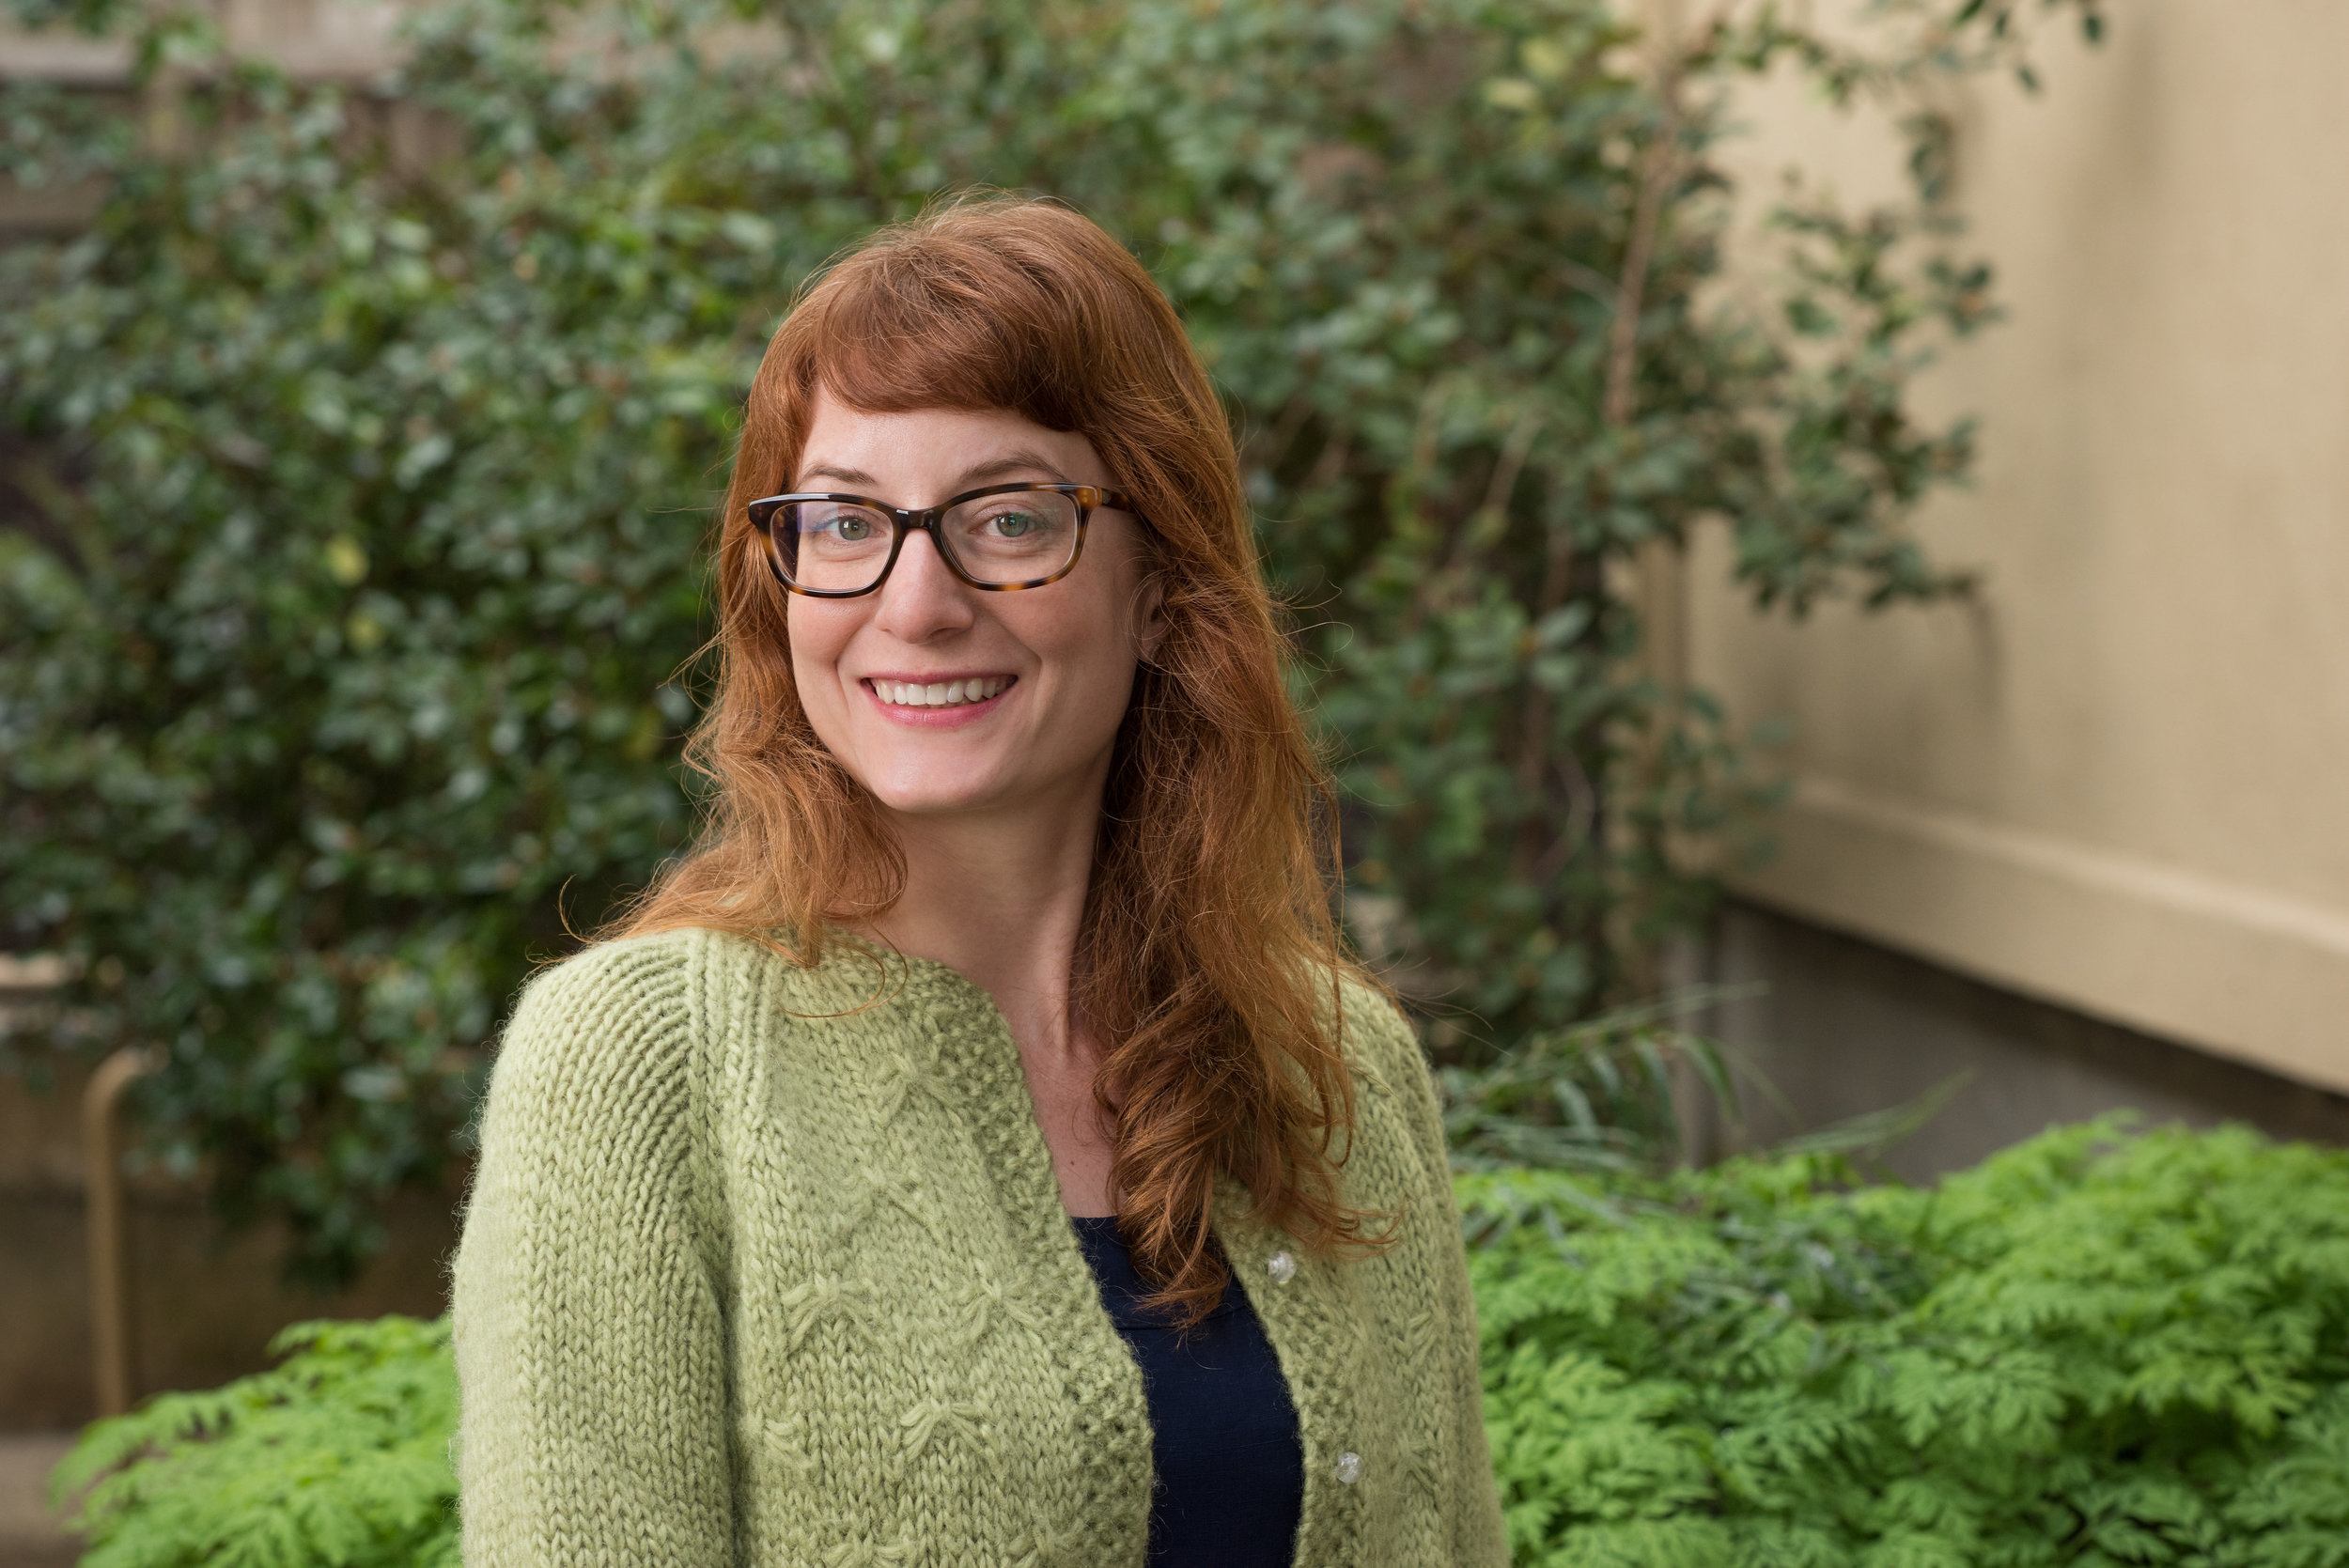 Amber Mikluscak, PLA, GISP   Principal, Senior Landscape Architect